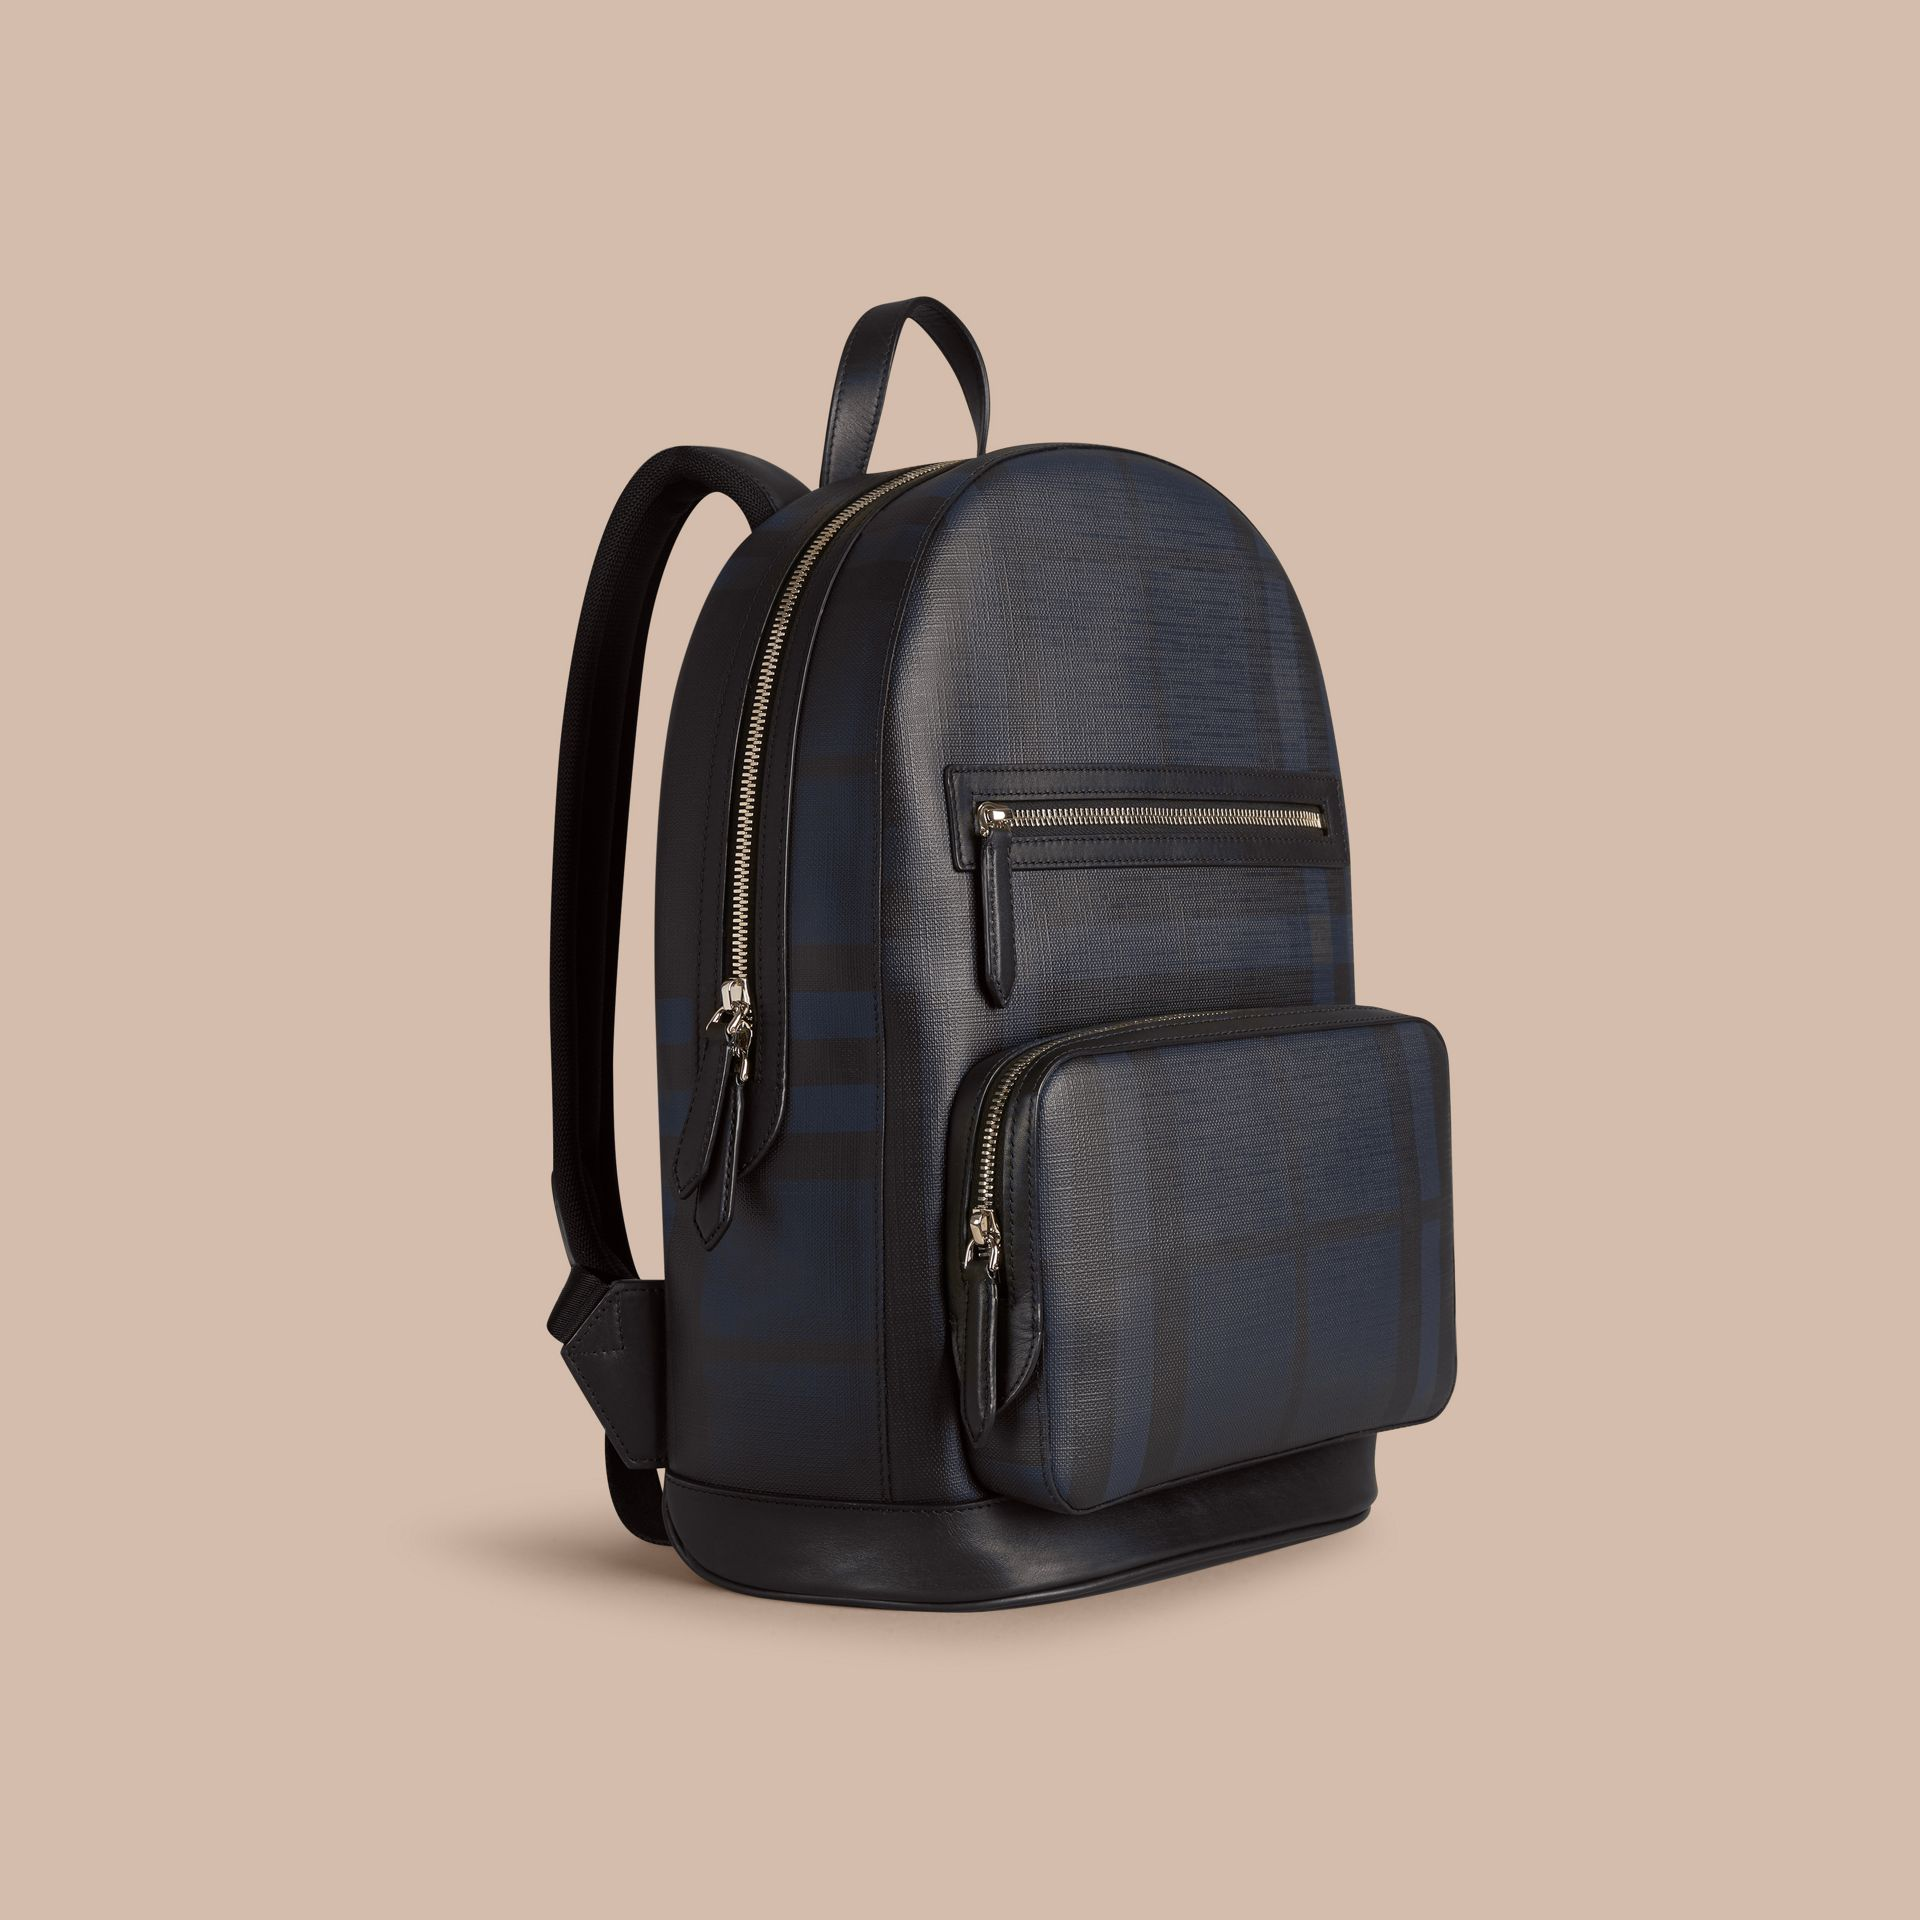 Navy/black London Check Backpack Navy/black - gallery image 1